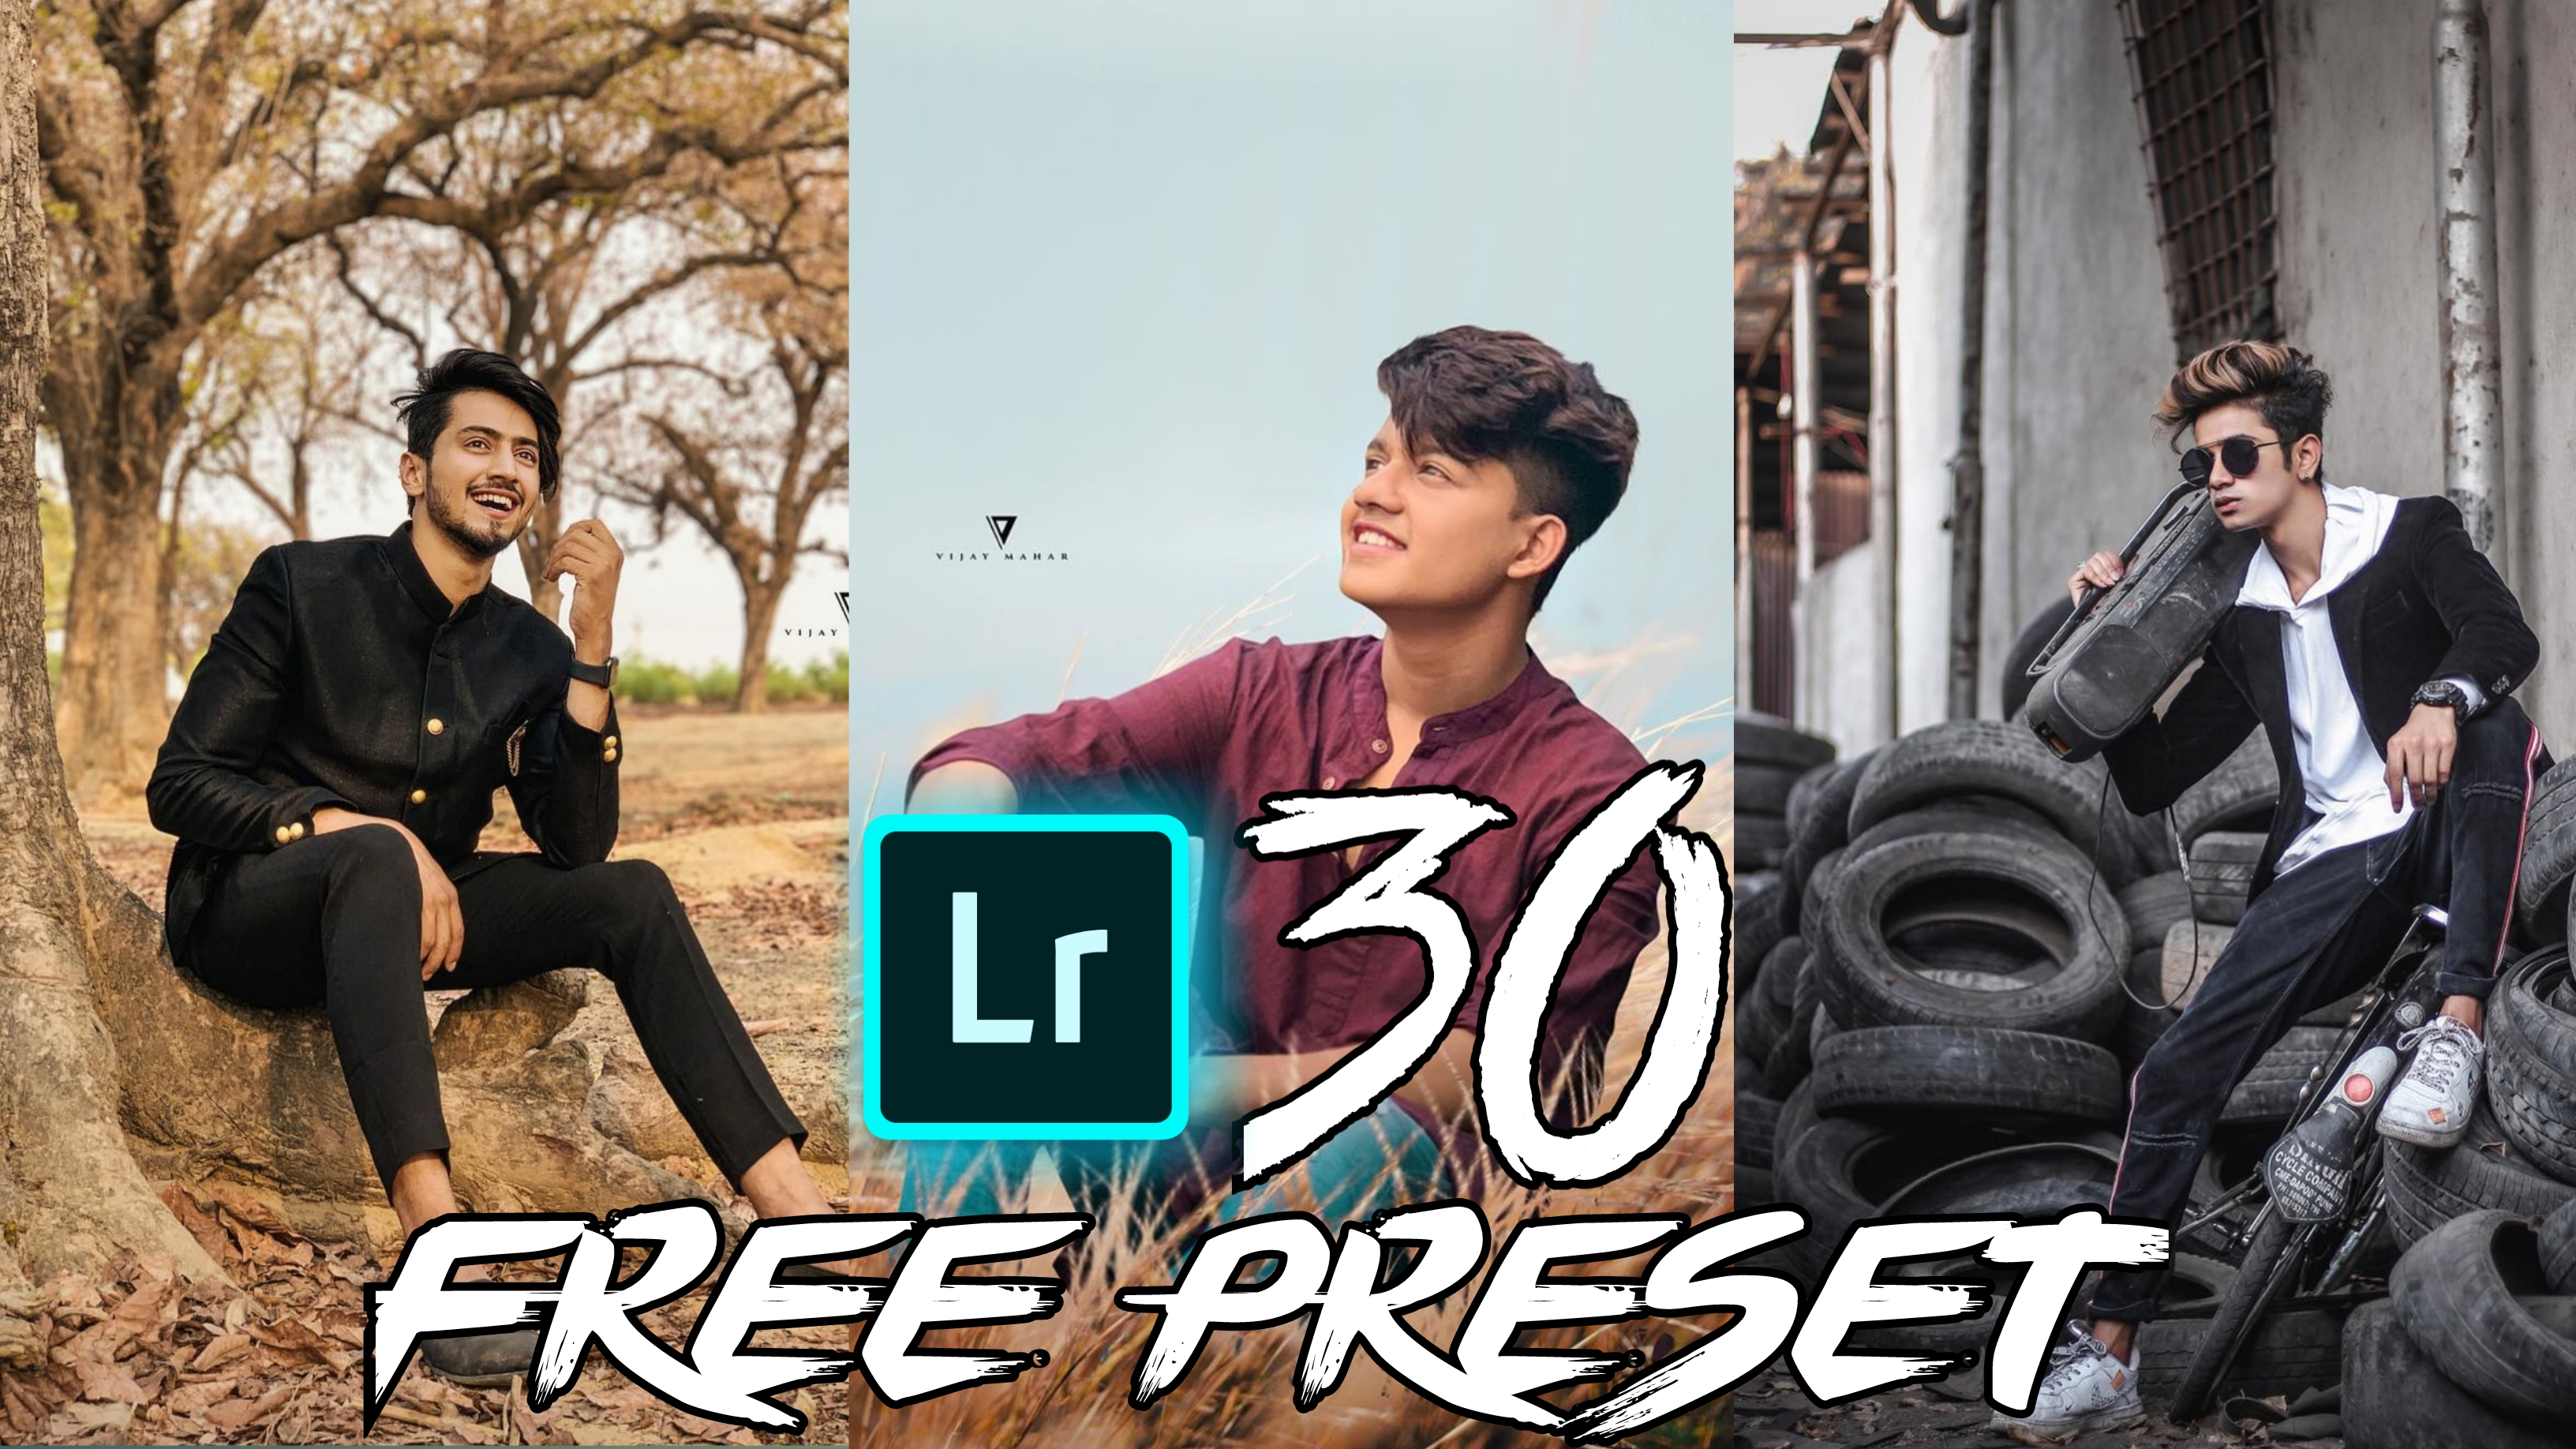 Download Top 30 free mobile lightroom presets - Badshah Editing Zone